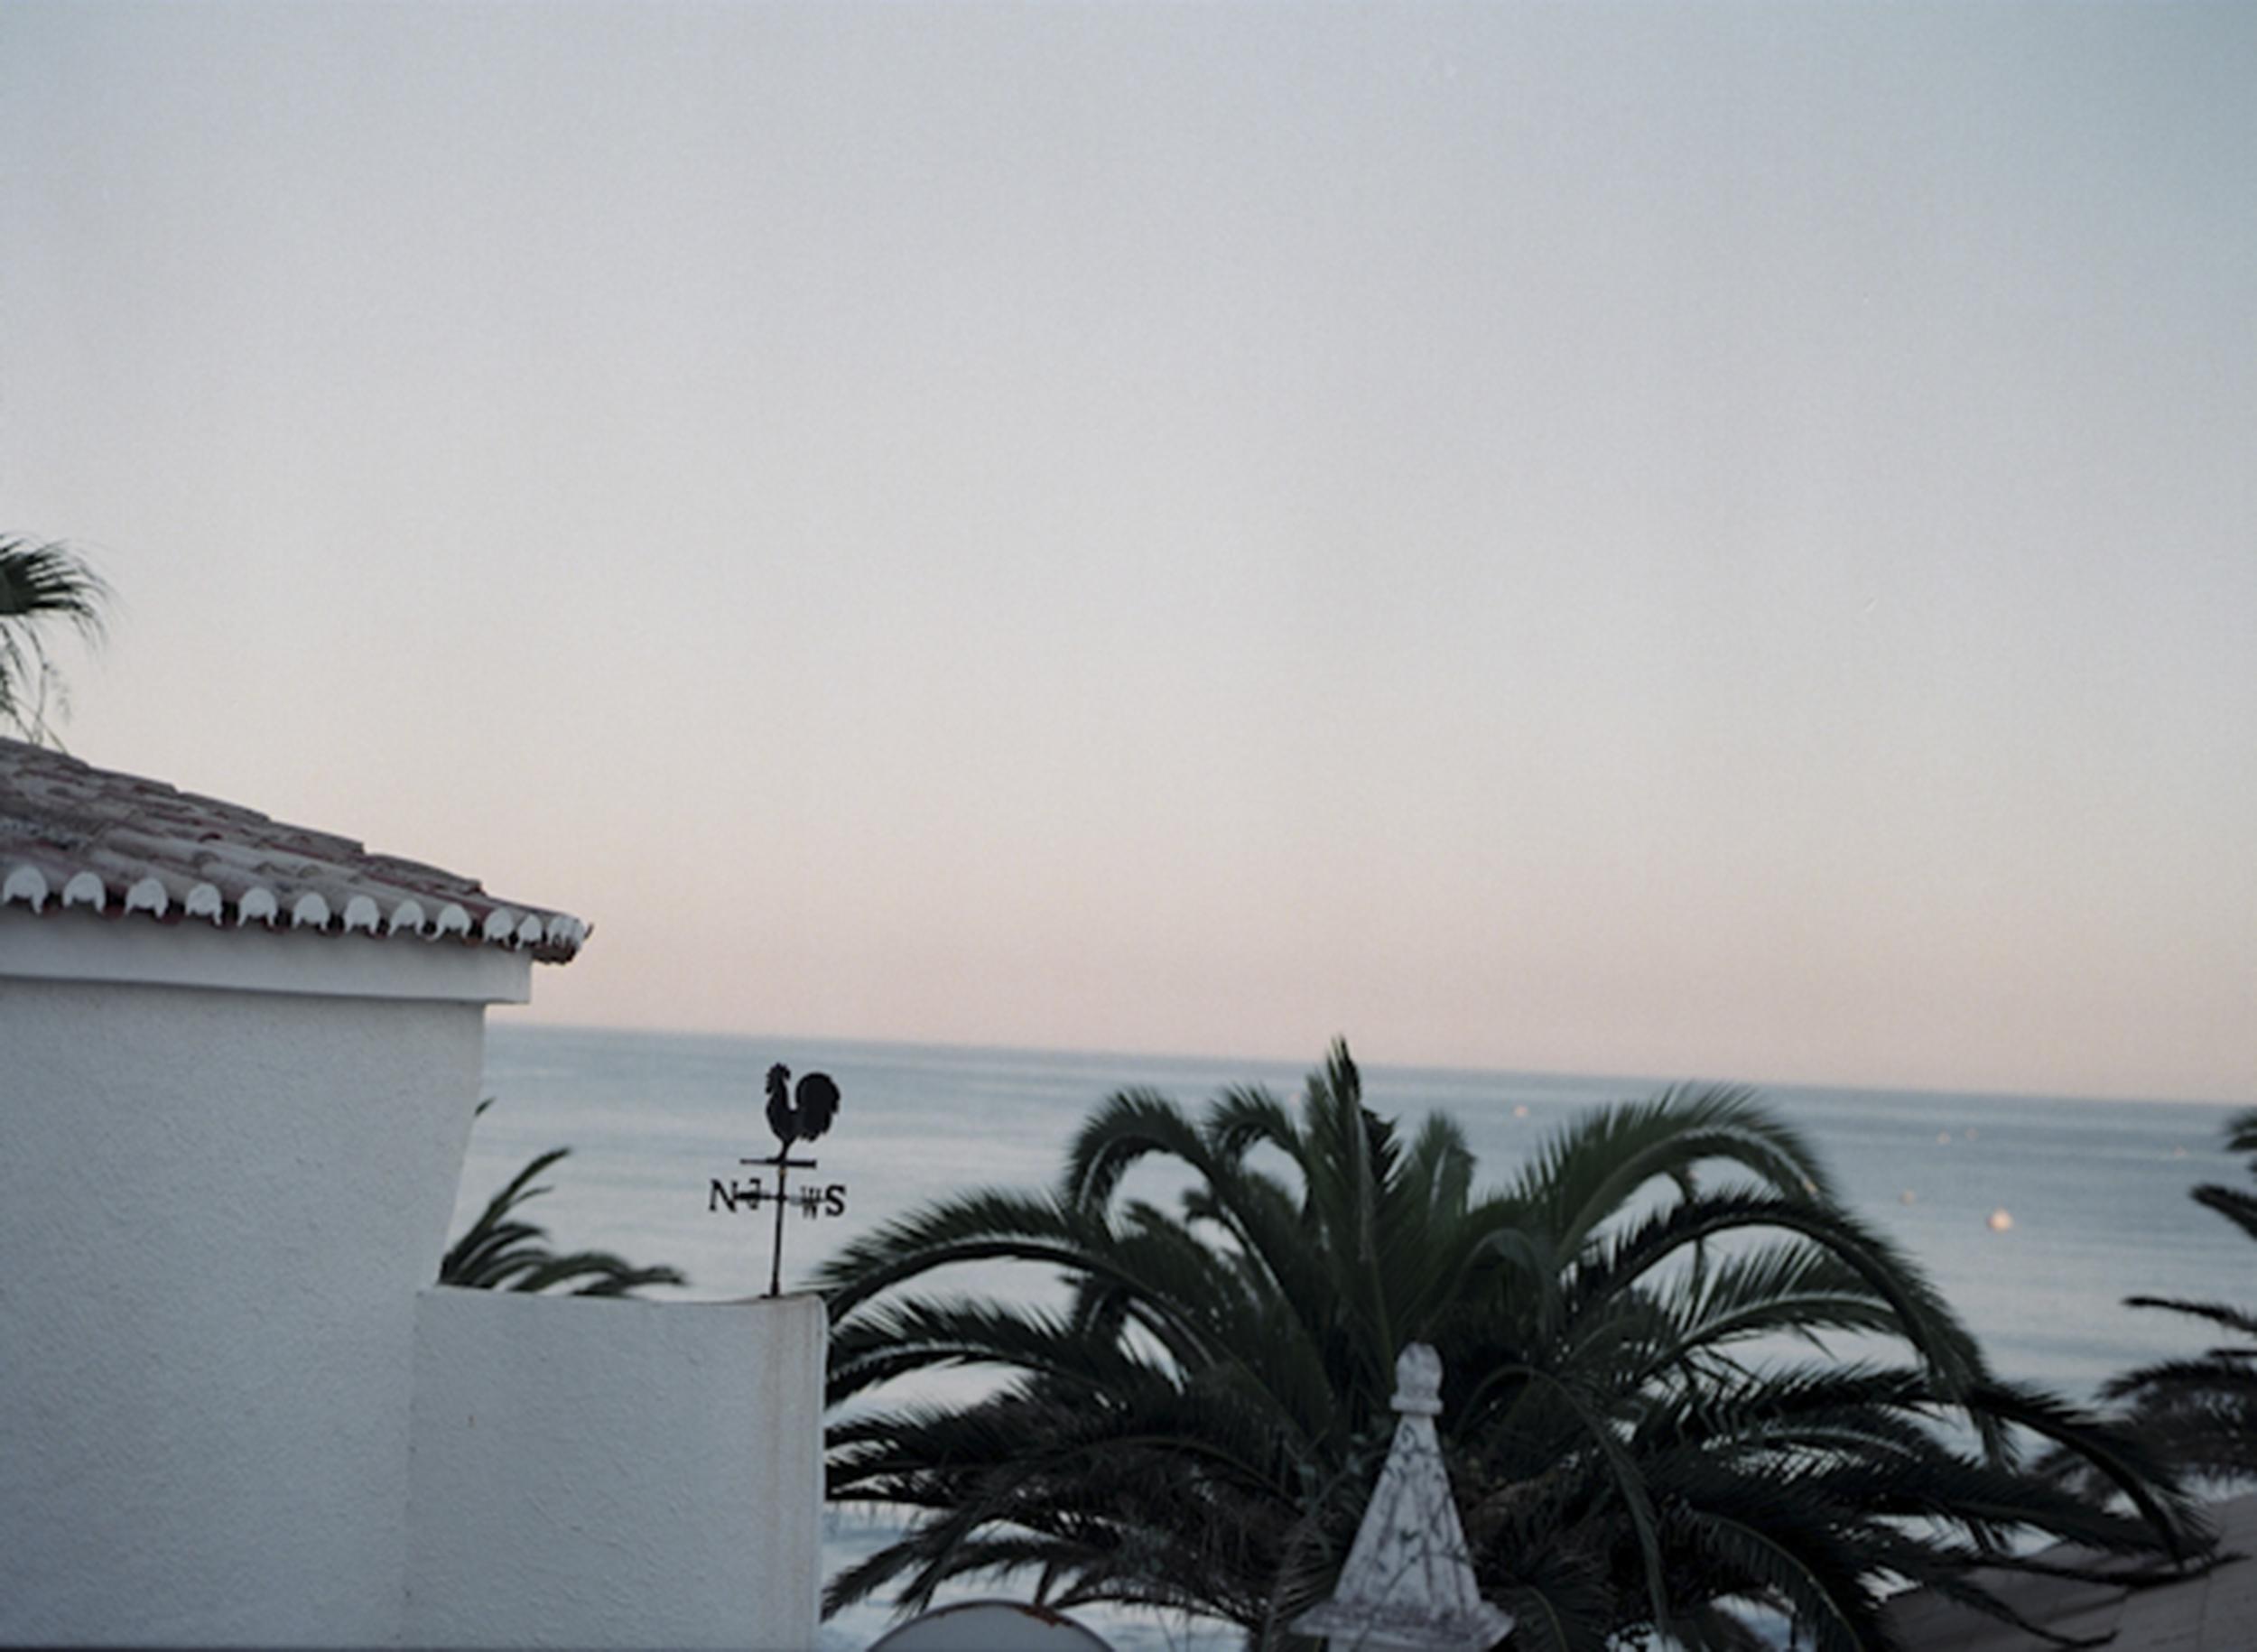 021_portugal-15.jpg